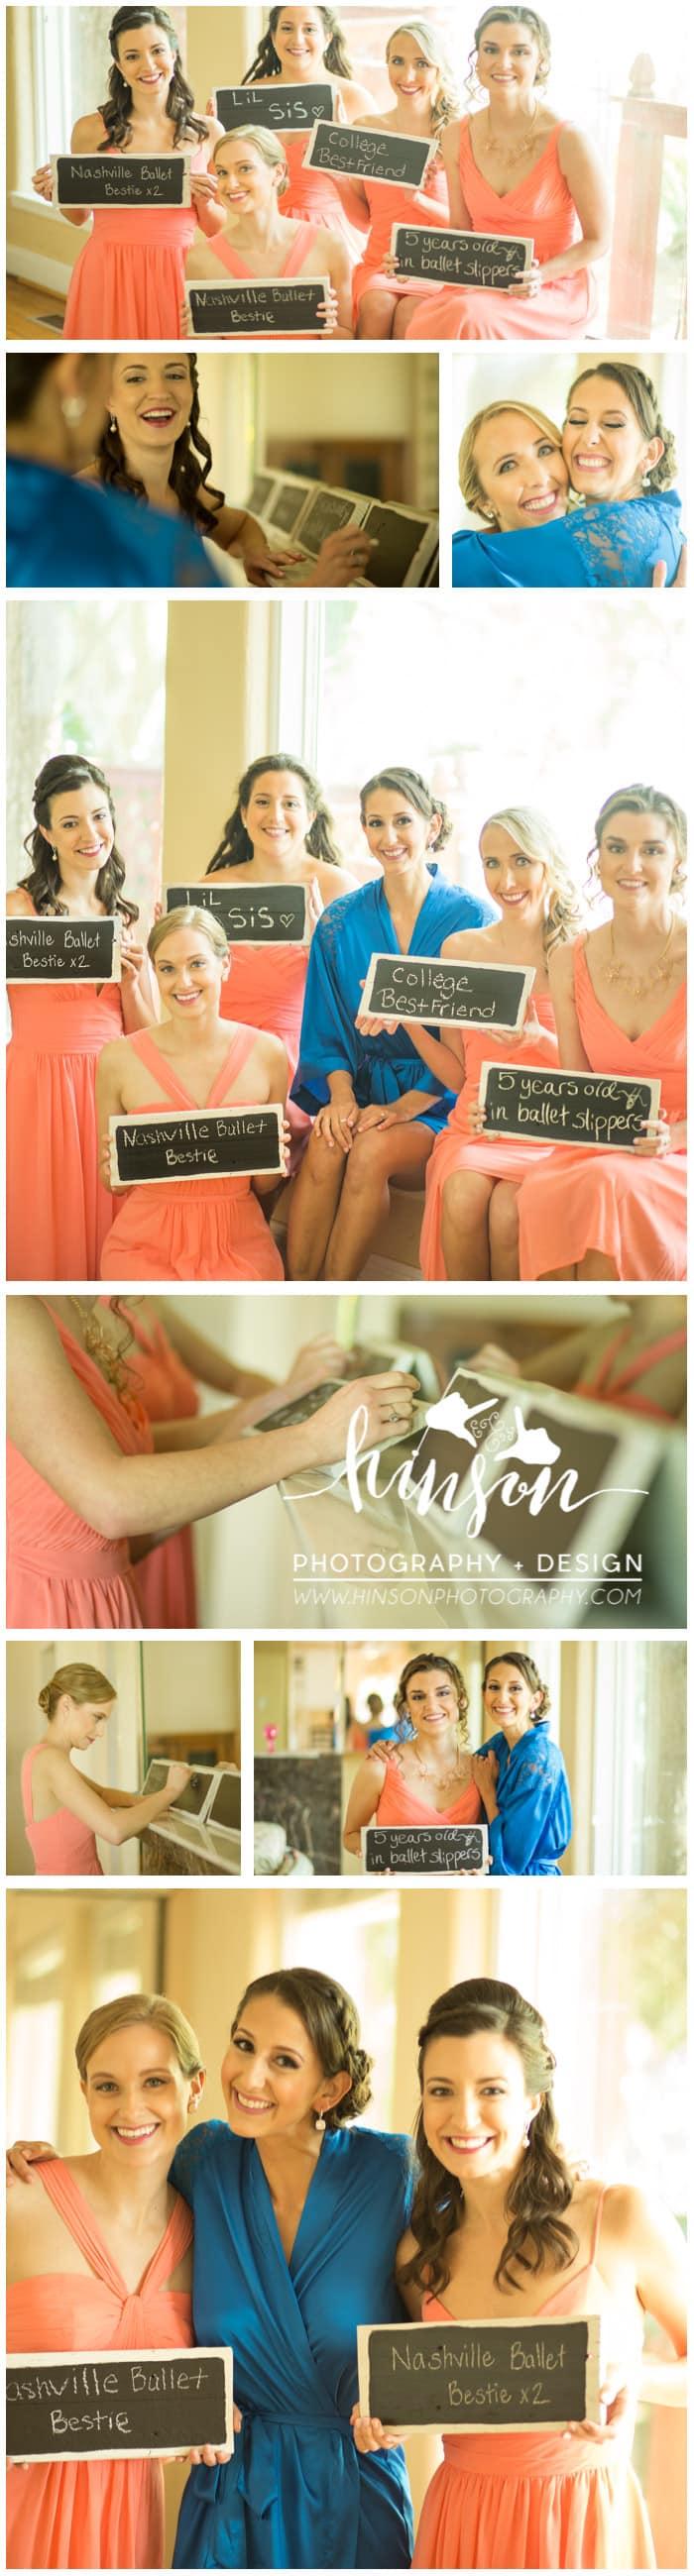 bridesmaids before picture wedding getting ready photo, bridesmaids chalkboard photo, daytona beach wedding photographer